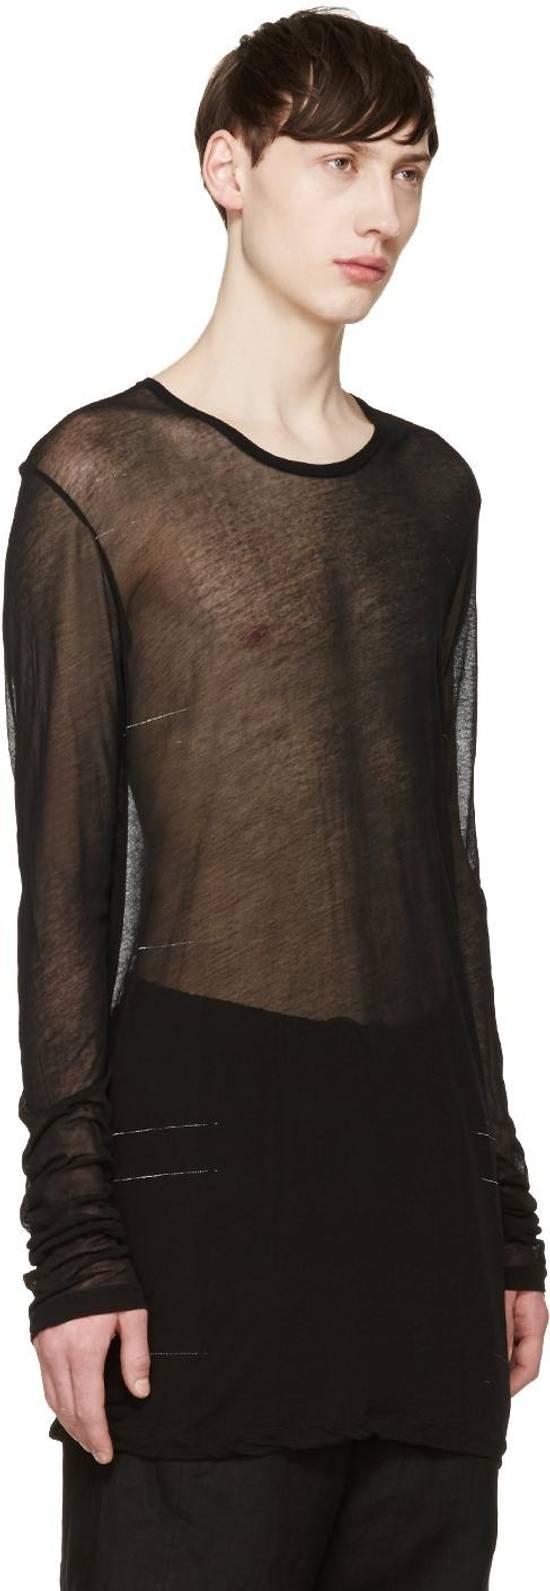 Julius SS16 sheer cotton long sleeve Size US S / EU 44-46 / 1 - 1